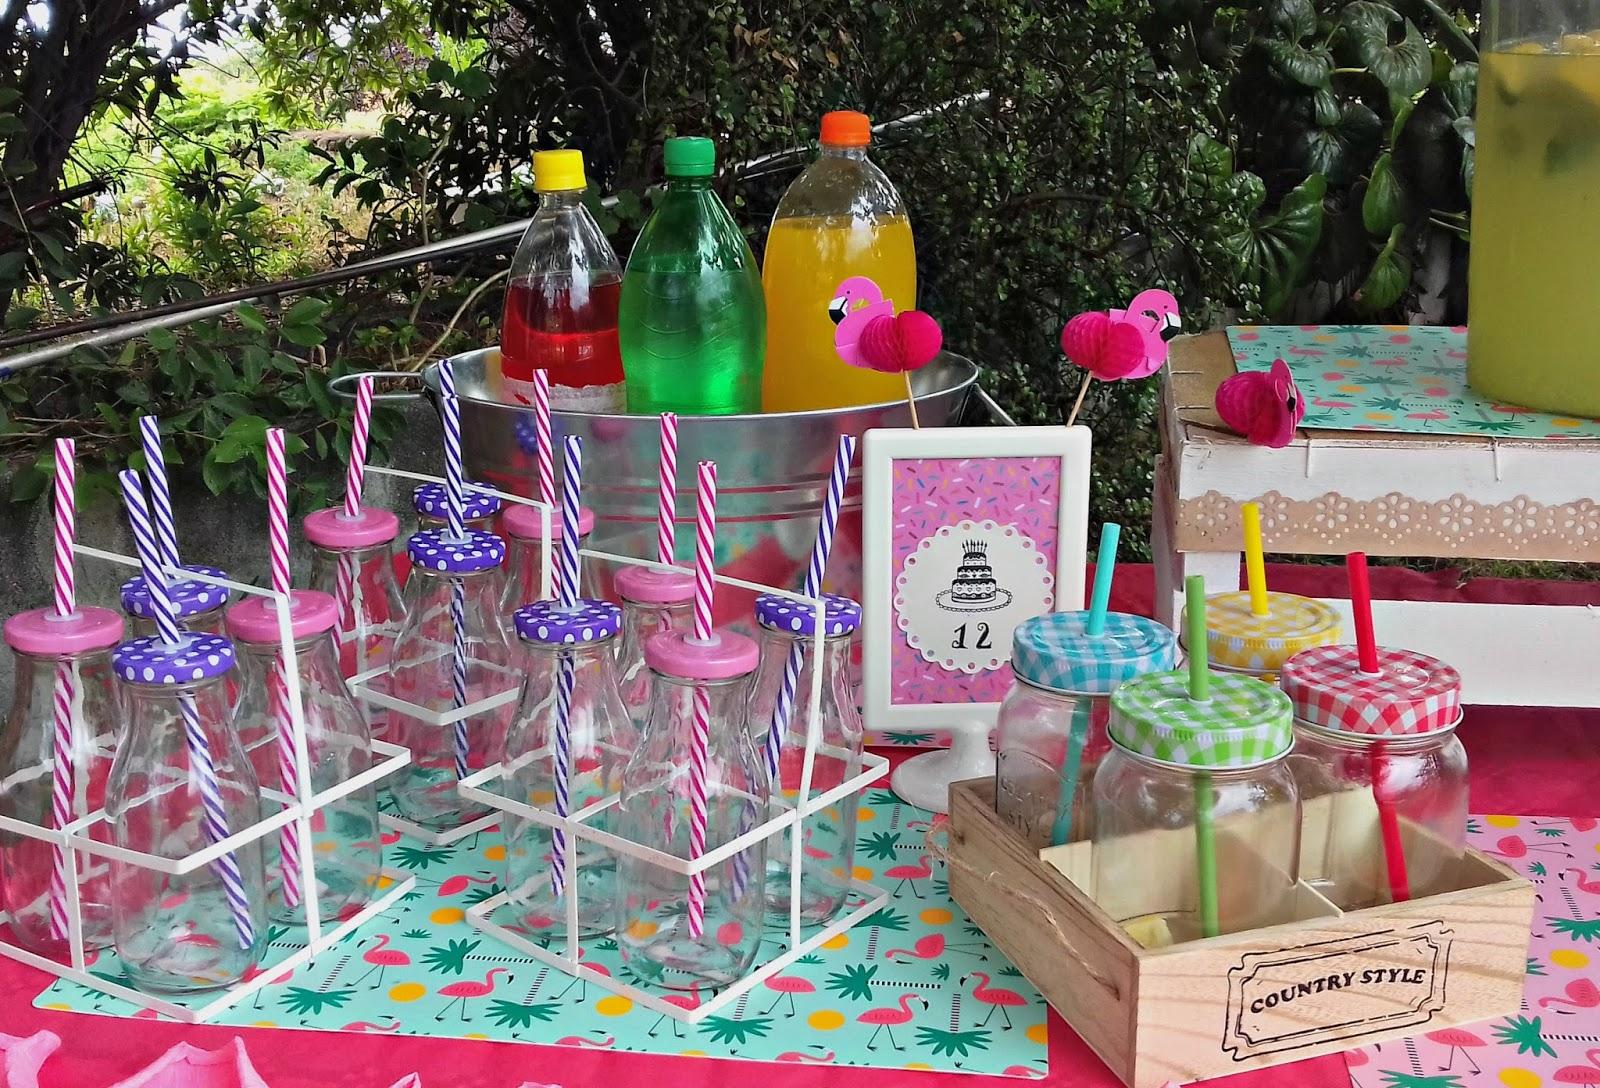 Celebra con ana compartiendo experiencias creativas for Fiesta de piscina